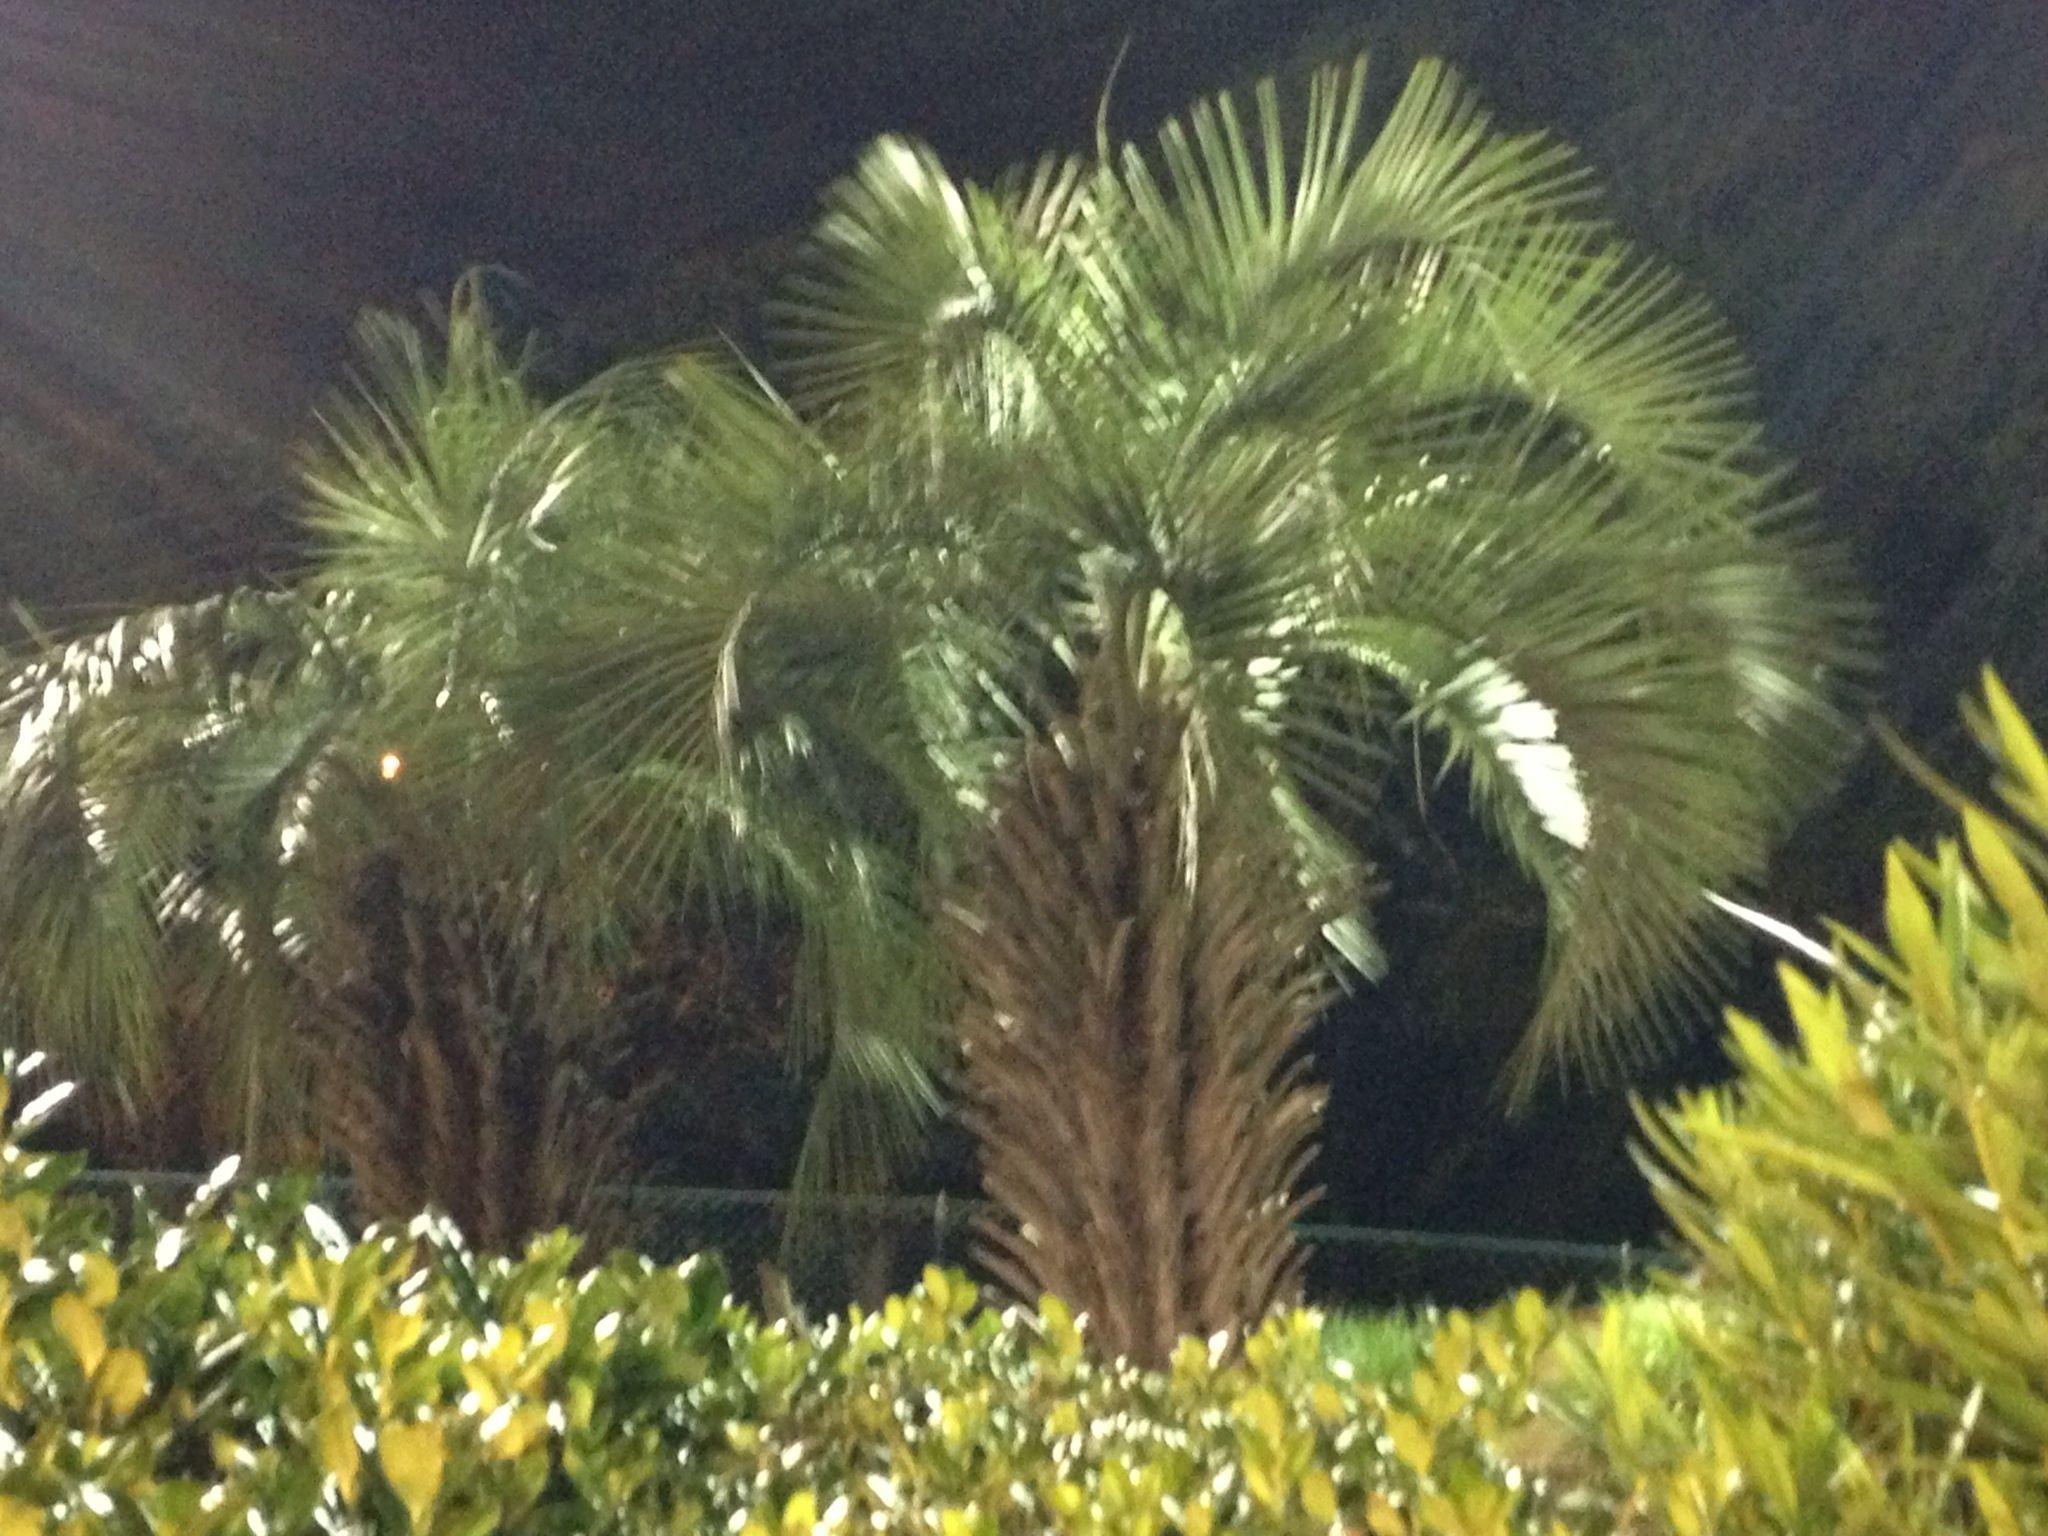 Myrtle Beach: Palm Trees - News - Bubblews